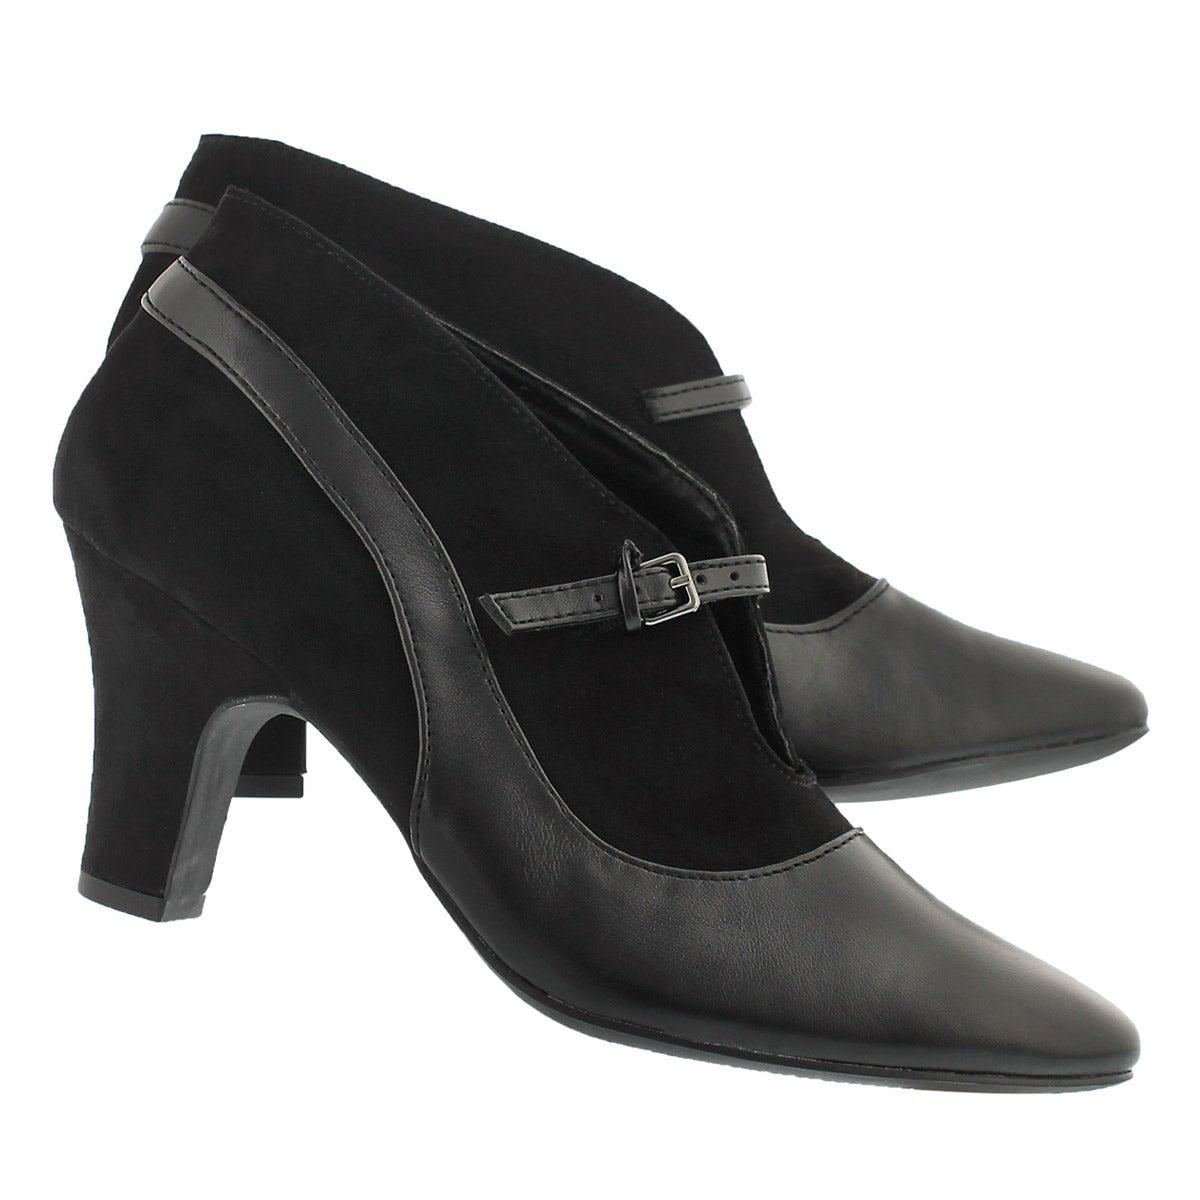 Lds Dalilah blk slip on dress heel